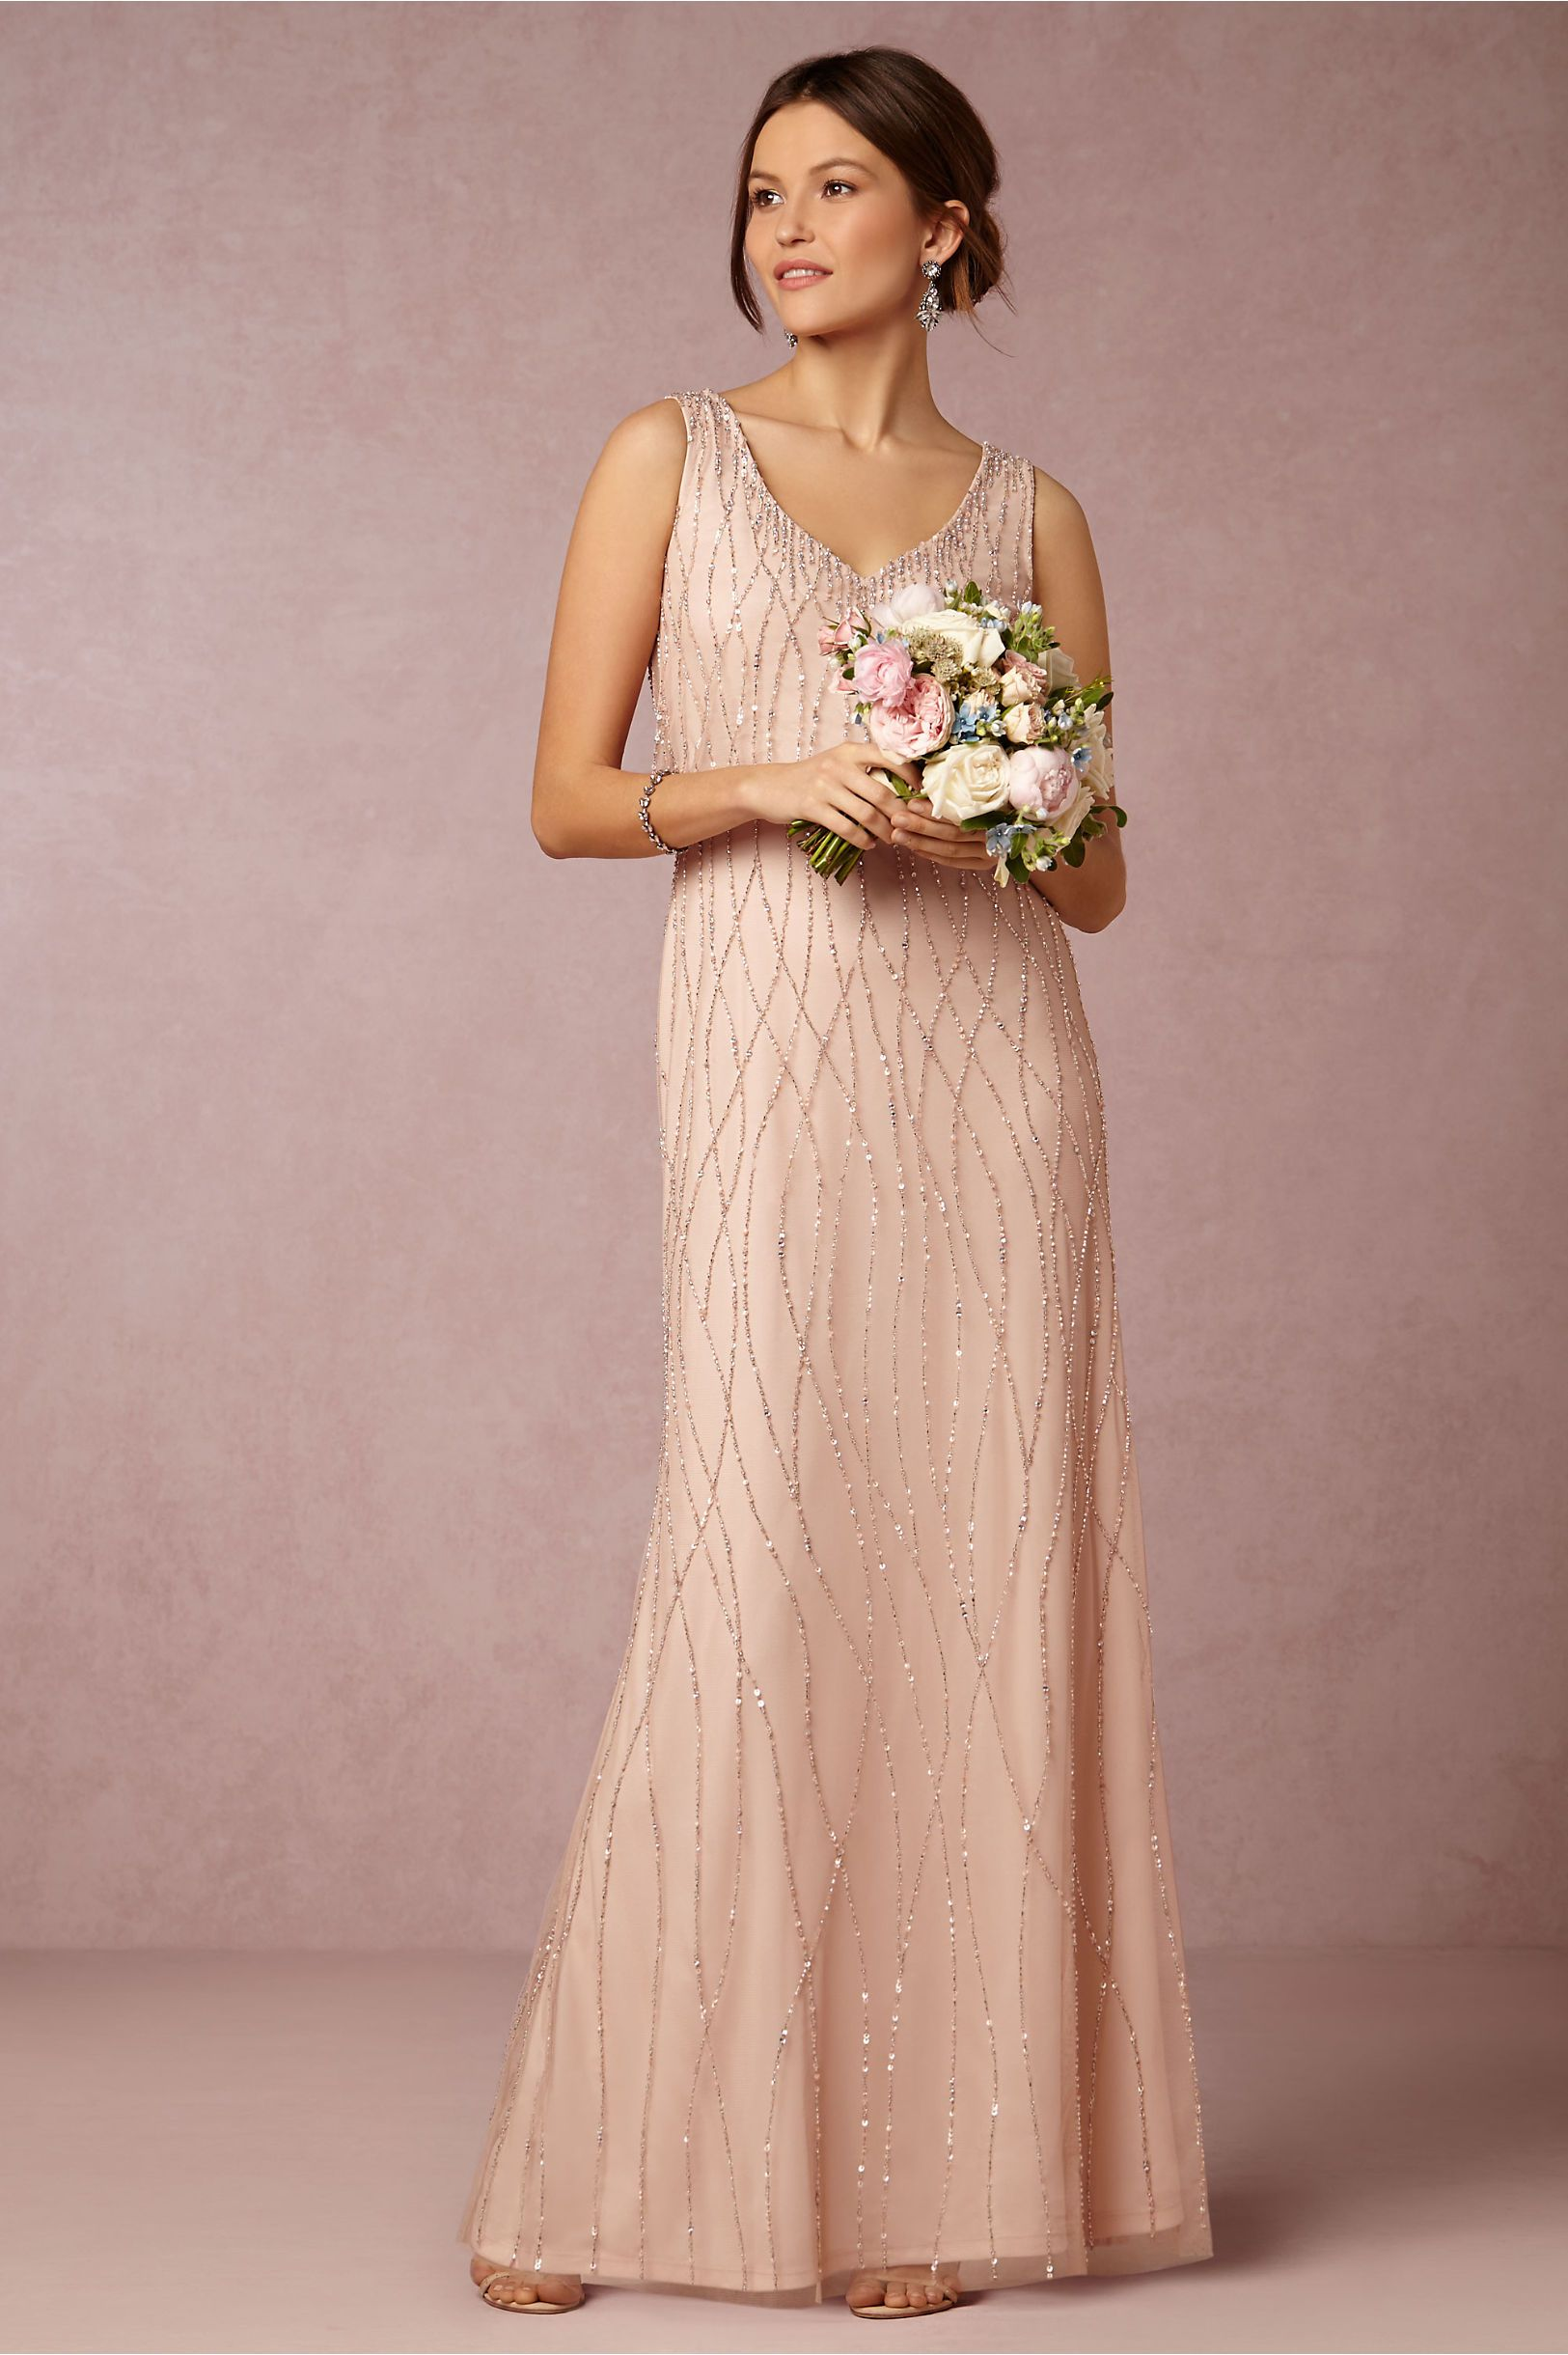 Wedding dresses brooklyn  Brooklyn Dress in Bridesmaids Bridesmaid Dresses Long at BHLDN